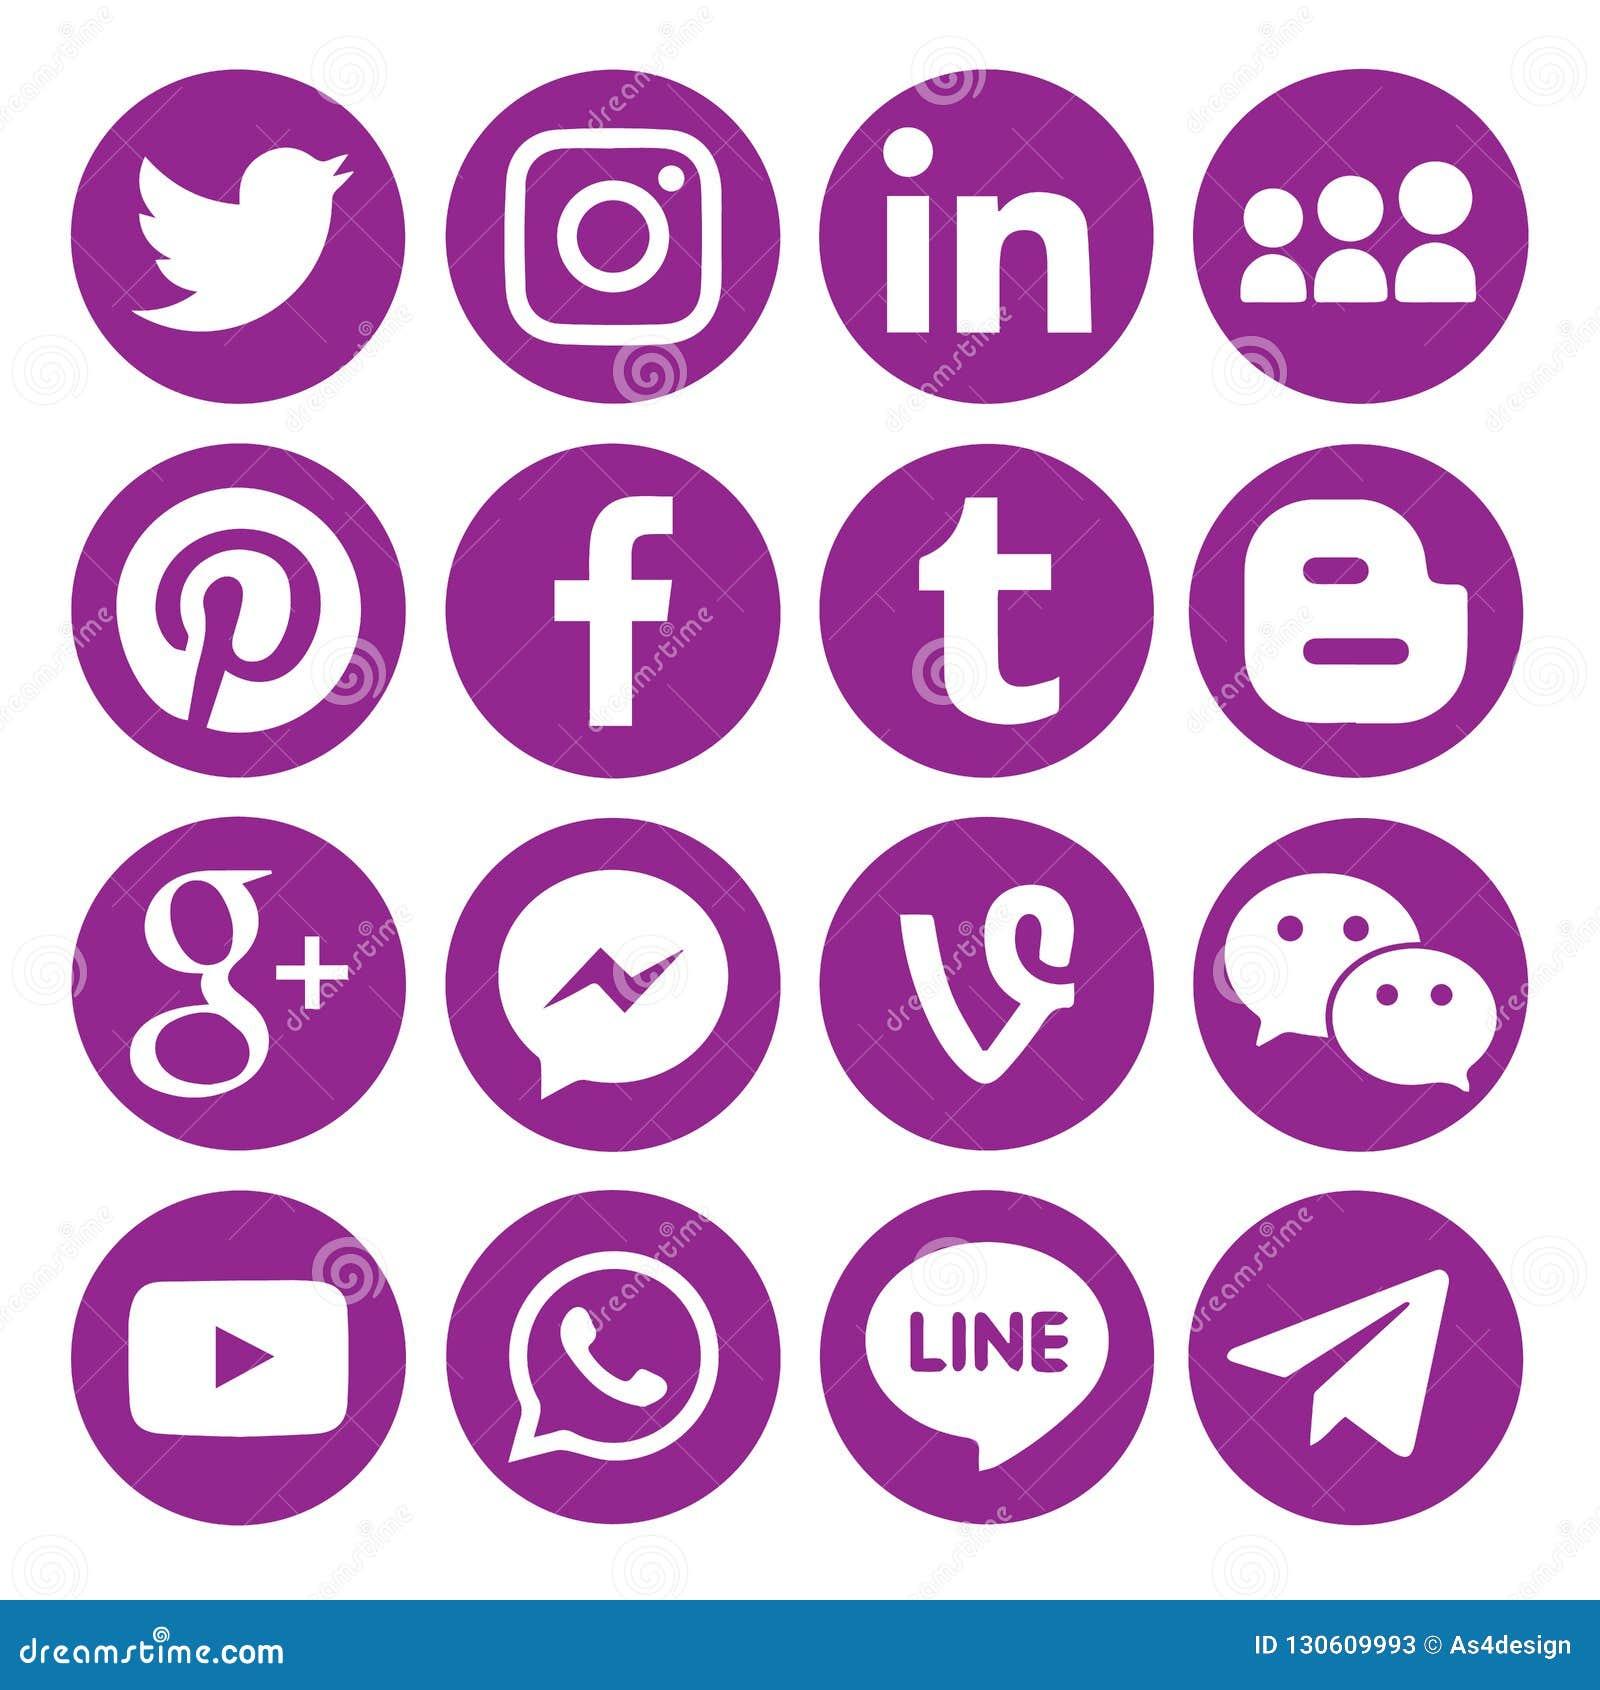 2dda3f092042 Set of popular black Circular social media icons or symbols printed on  paper: , Twitter, Blogger ,Facebook, Instagram, Pinterest,Google Plus, ...